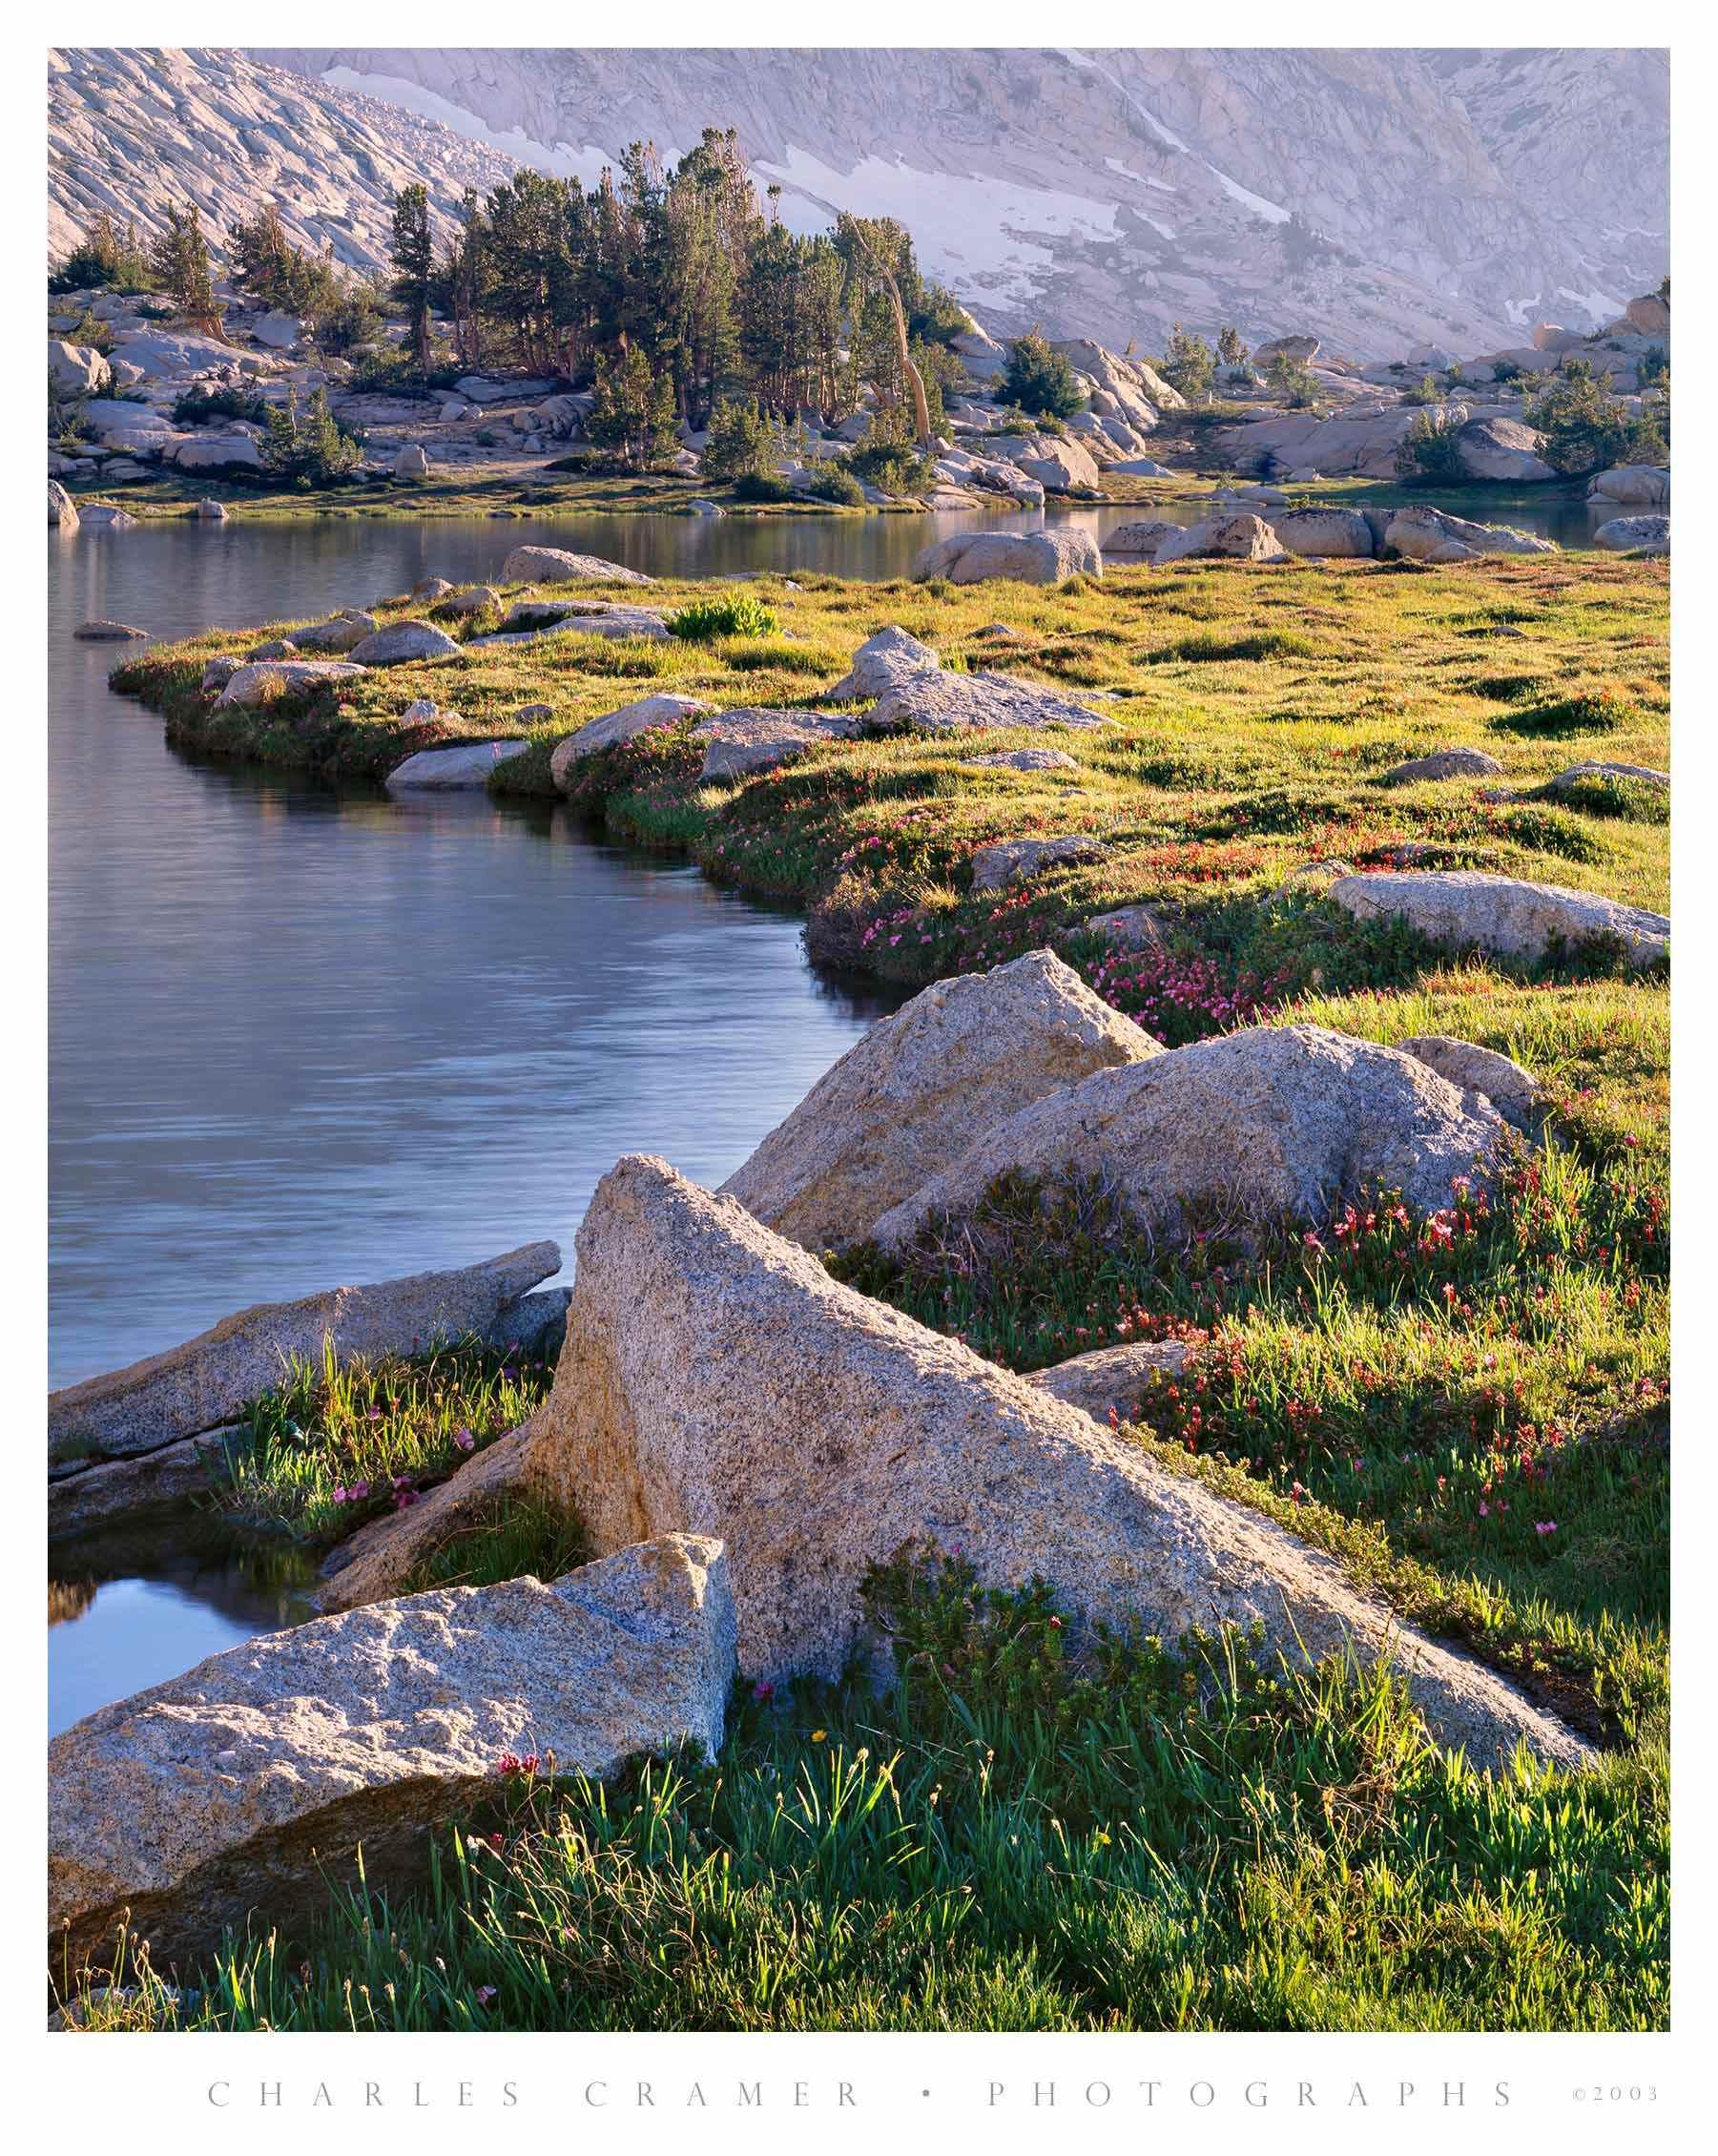 Rocks and Wildflowers, Upper Young Lake, Yosemite